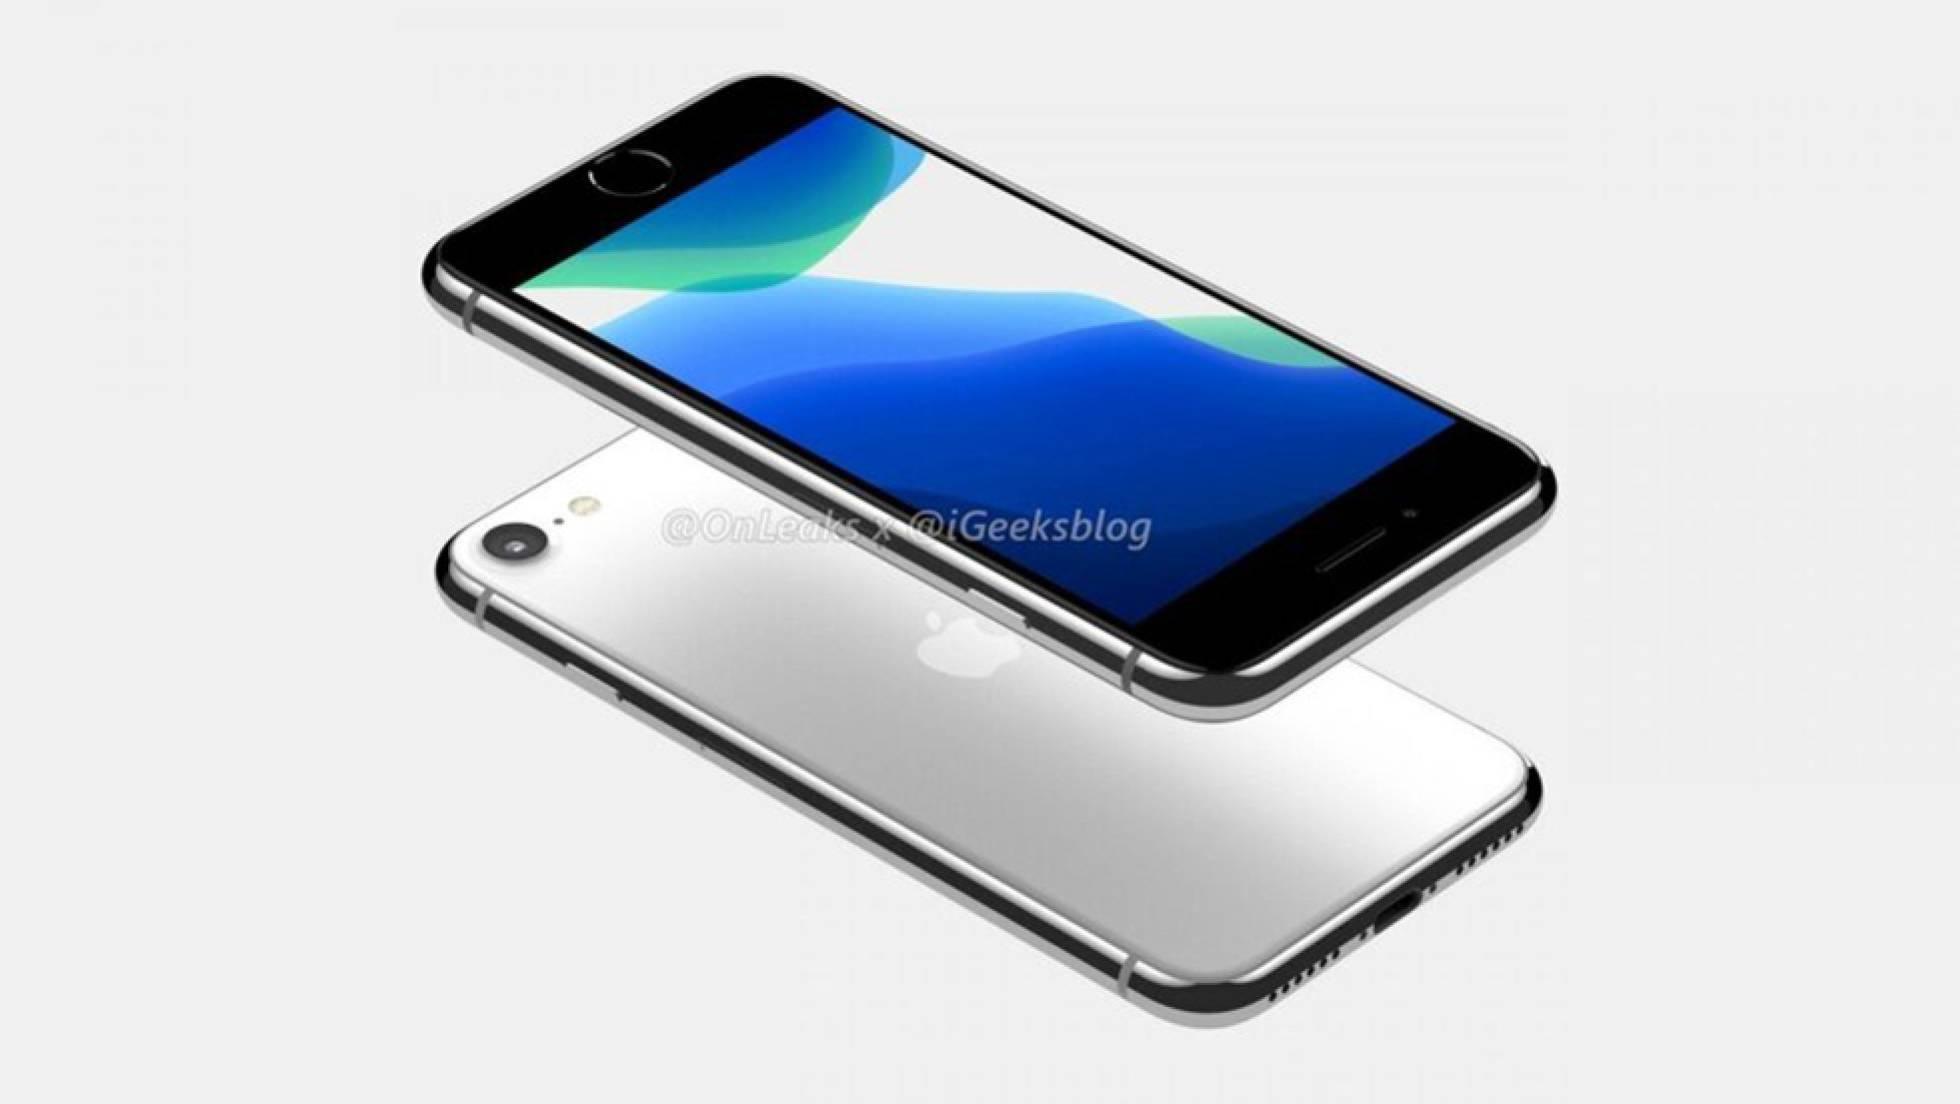 iPhone 9/9 Plus齐曝光:最大5.5英寸屏 配置大幅升级